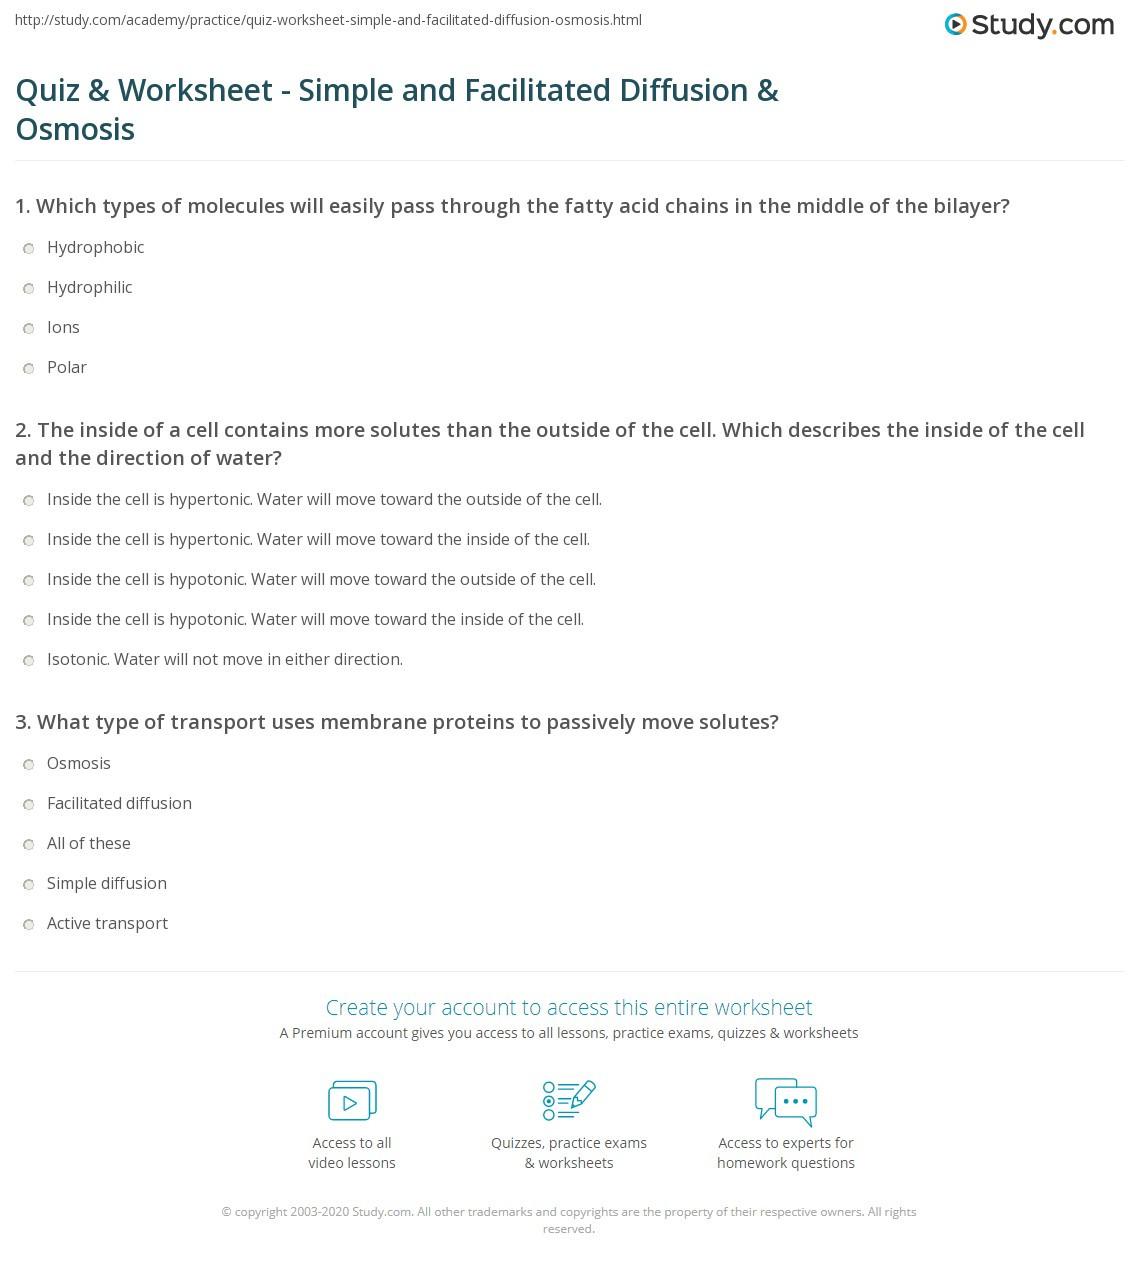 30 Diffusion And Osmosis Worksheet Answers